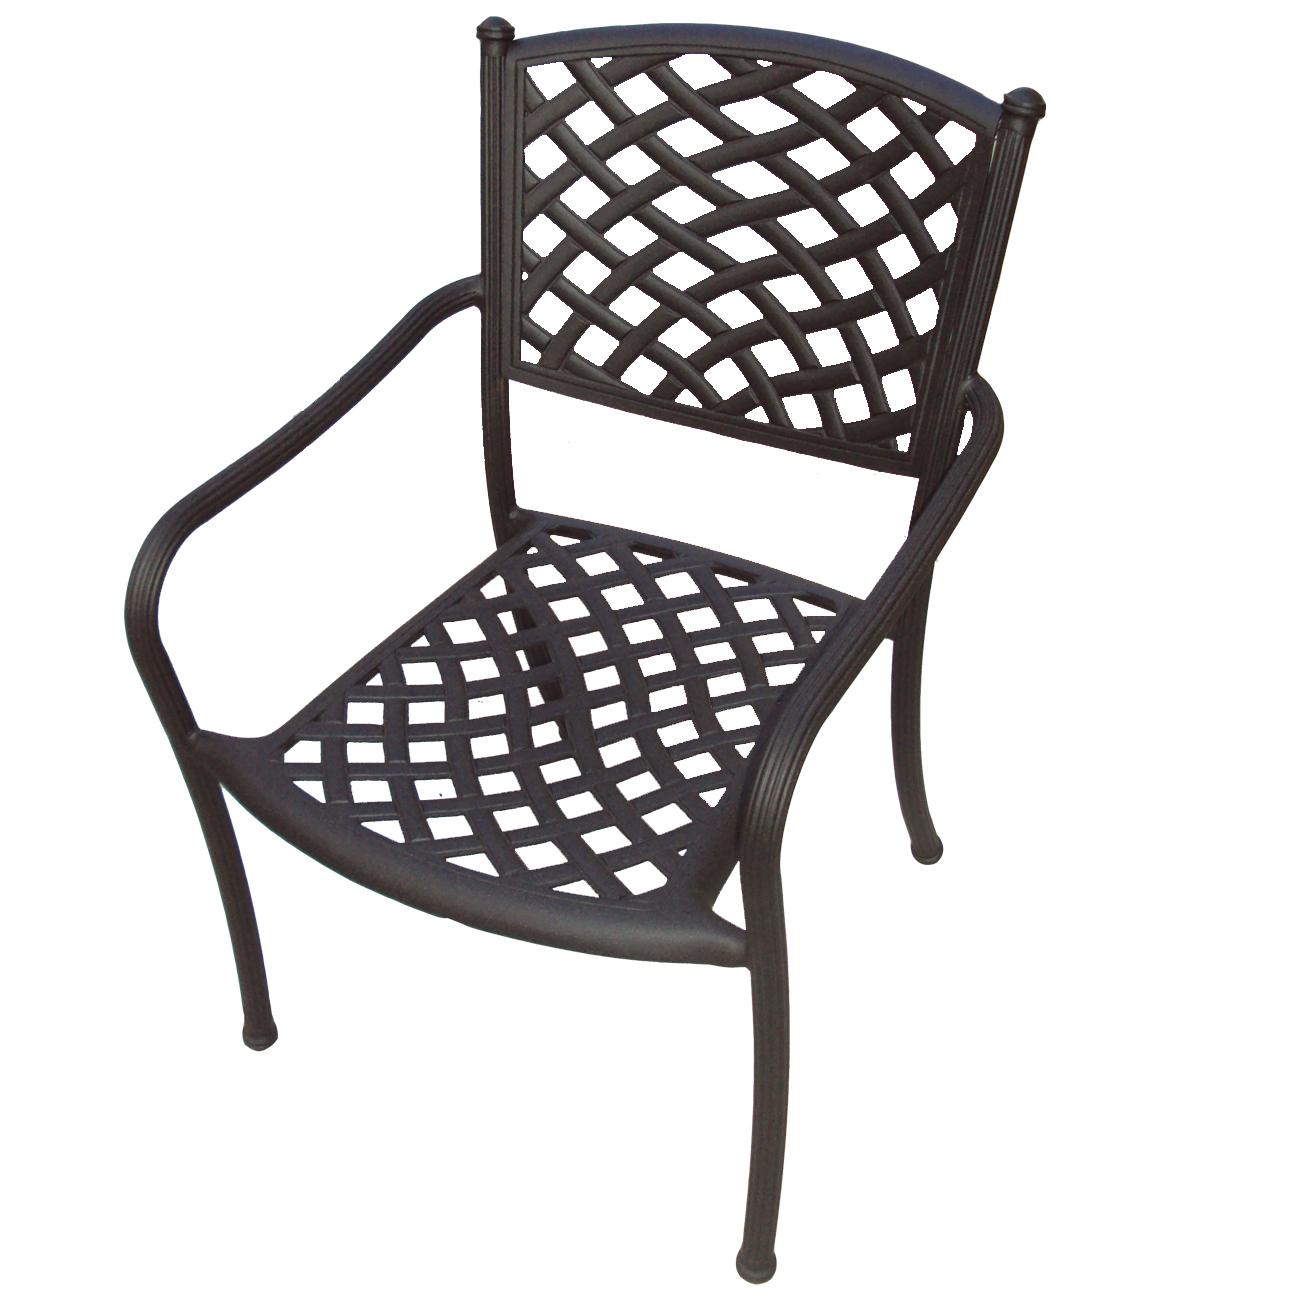 sc 1 st  Plantation Prestige Furniture & Madrid u2013 Dining Side and Bar Seating | Plantation Prestige Furniture